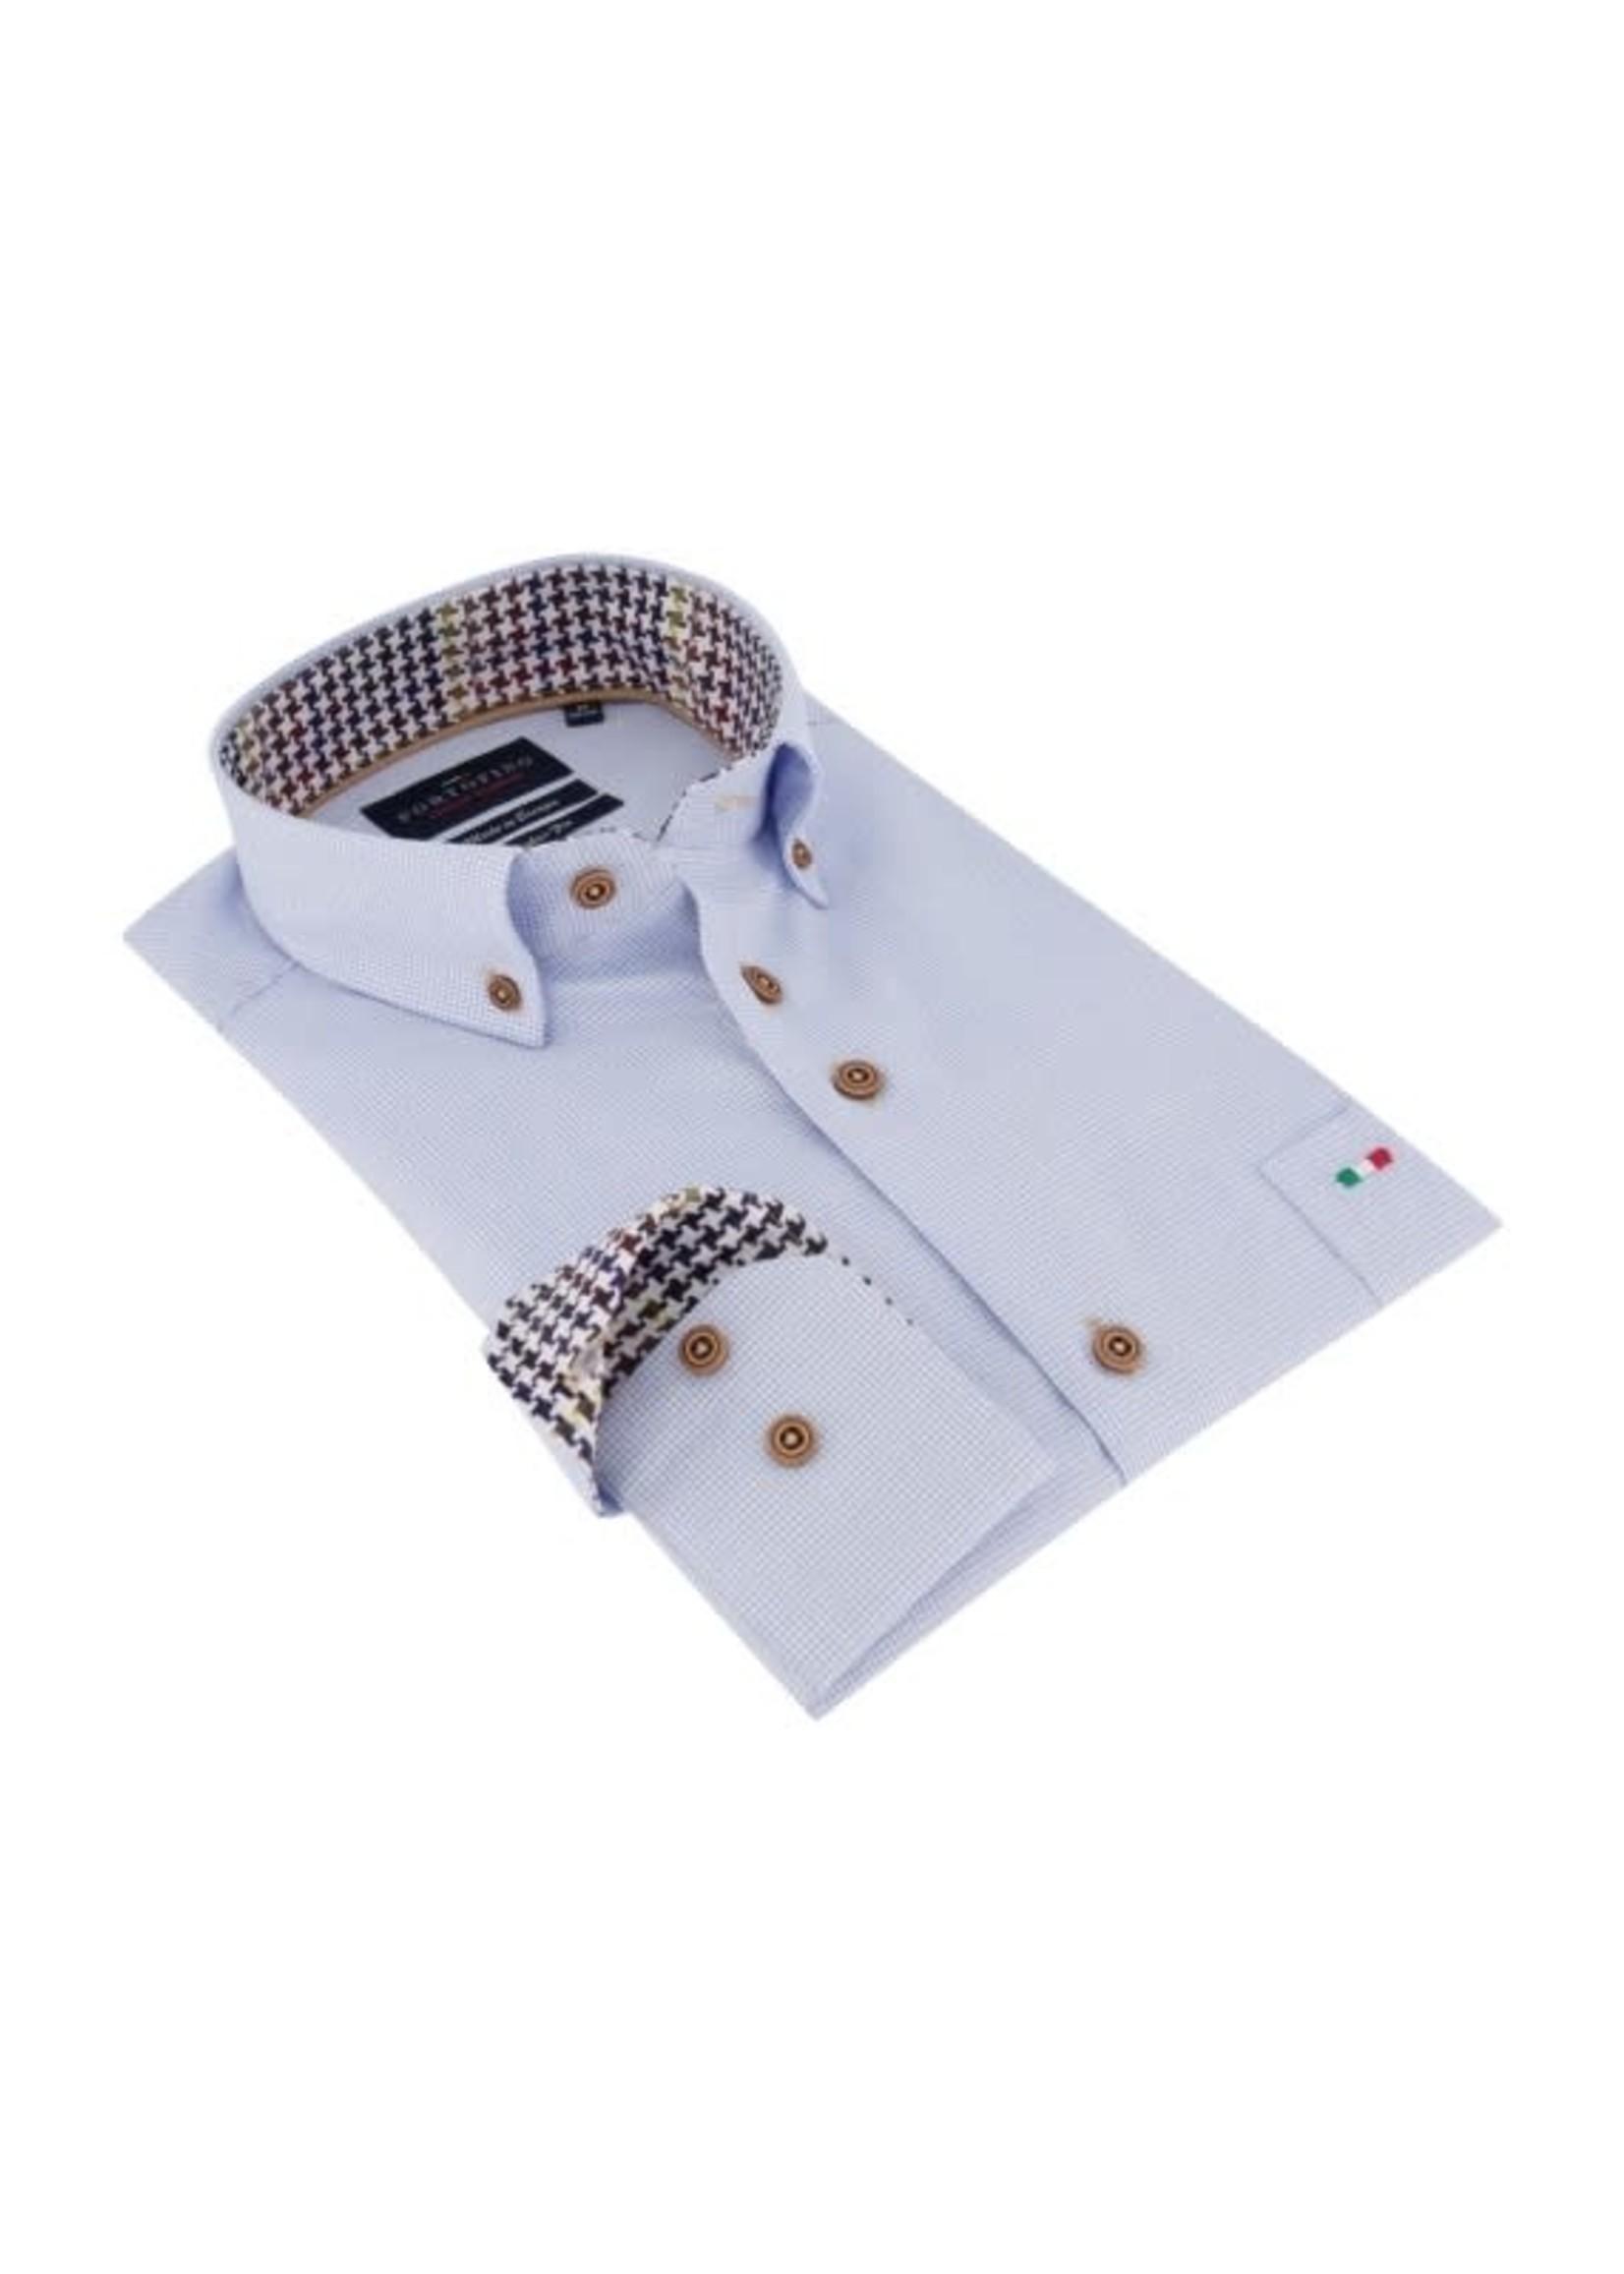 Portofino overhemd lichtblauw ruitje